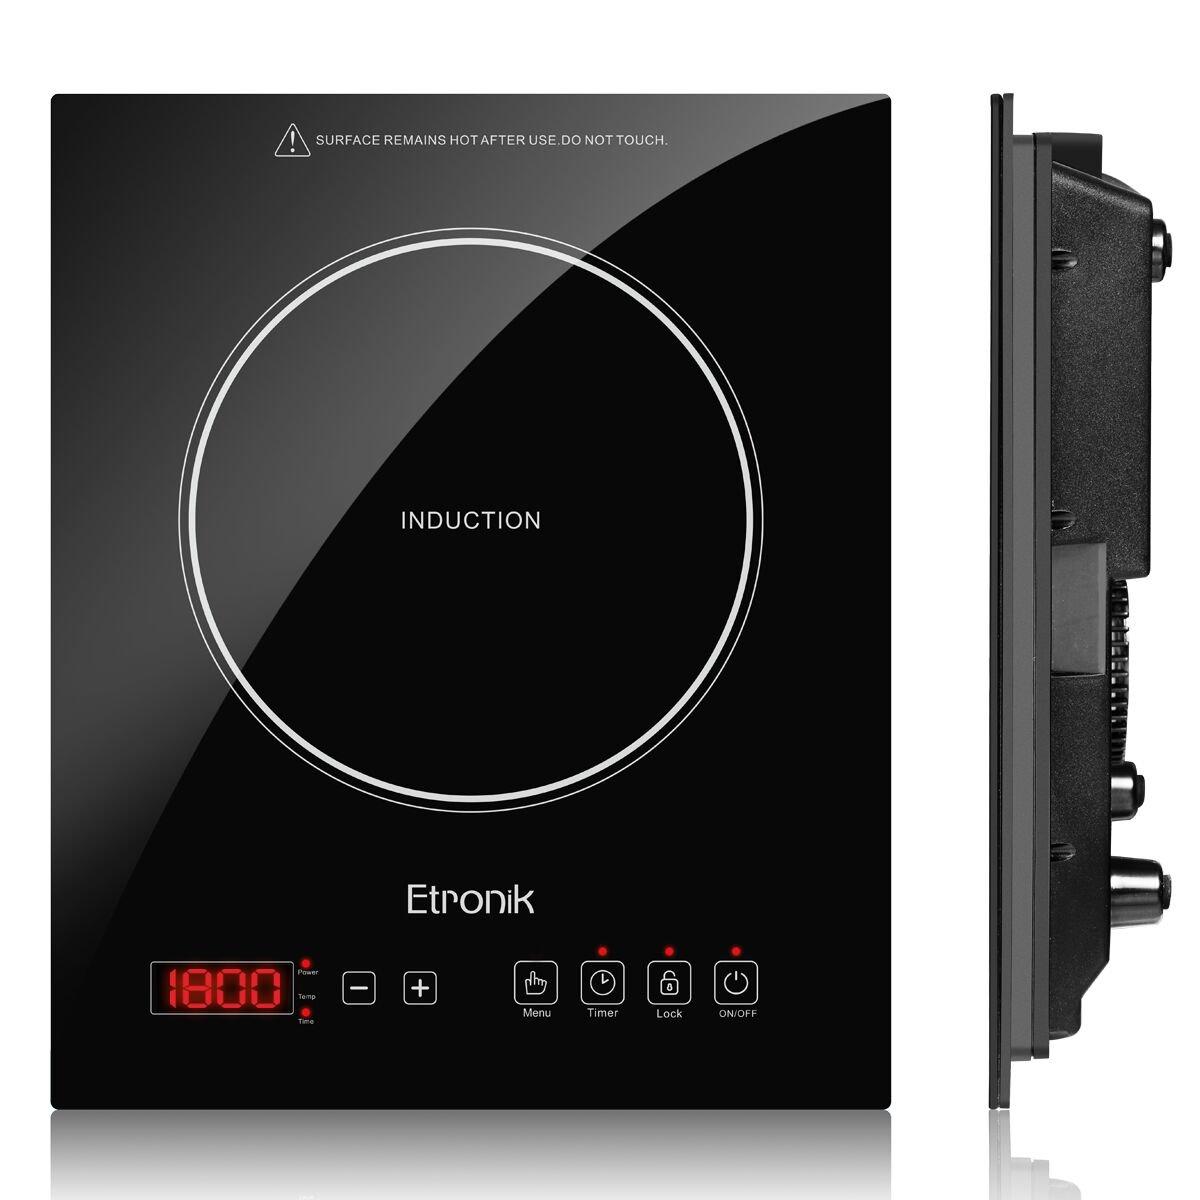 countertops watch watt best cooktop burner duxtop induction portable reviews countertop youtube